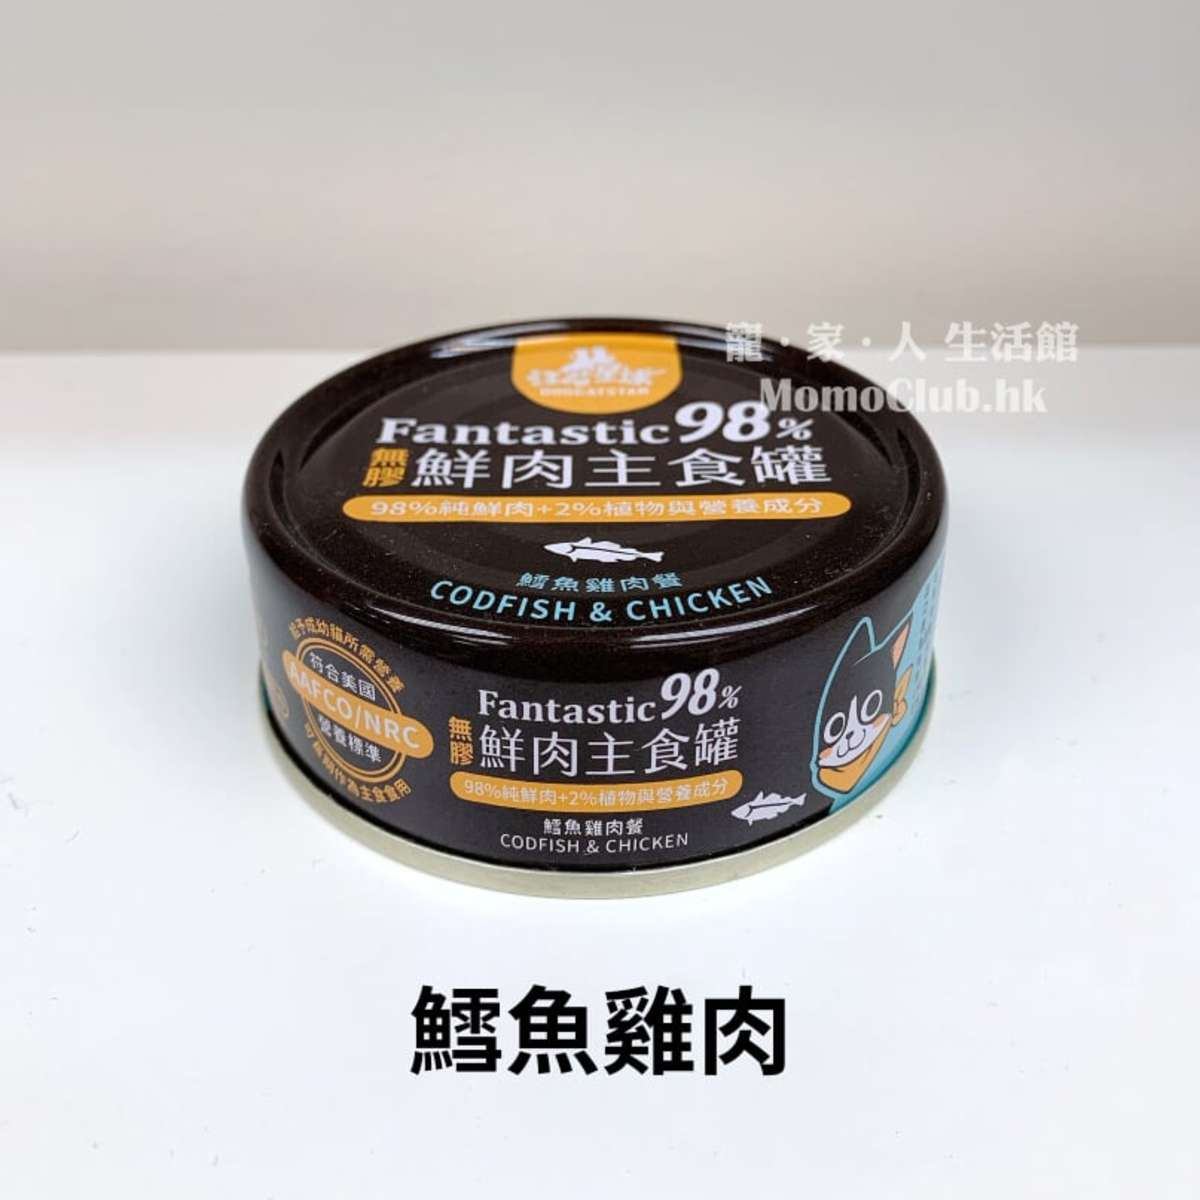 98% Fantastic Wet Food (Codfish & Chicken) 3罐, 85g x 3